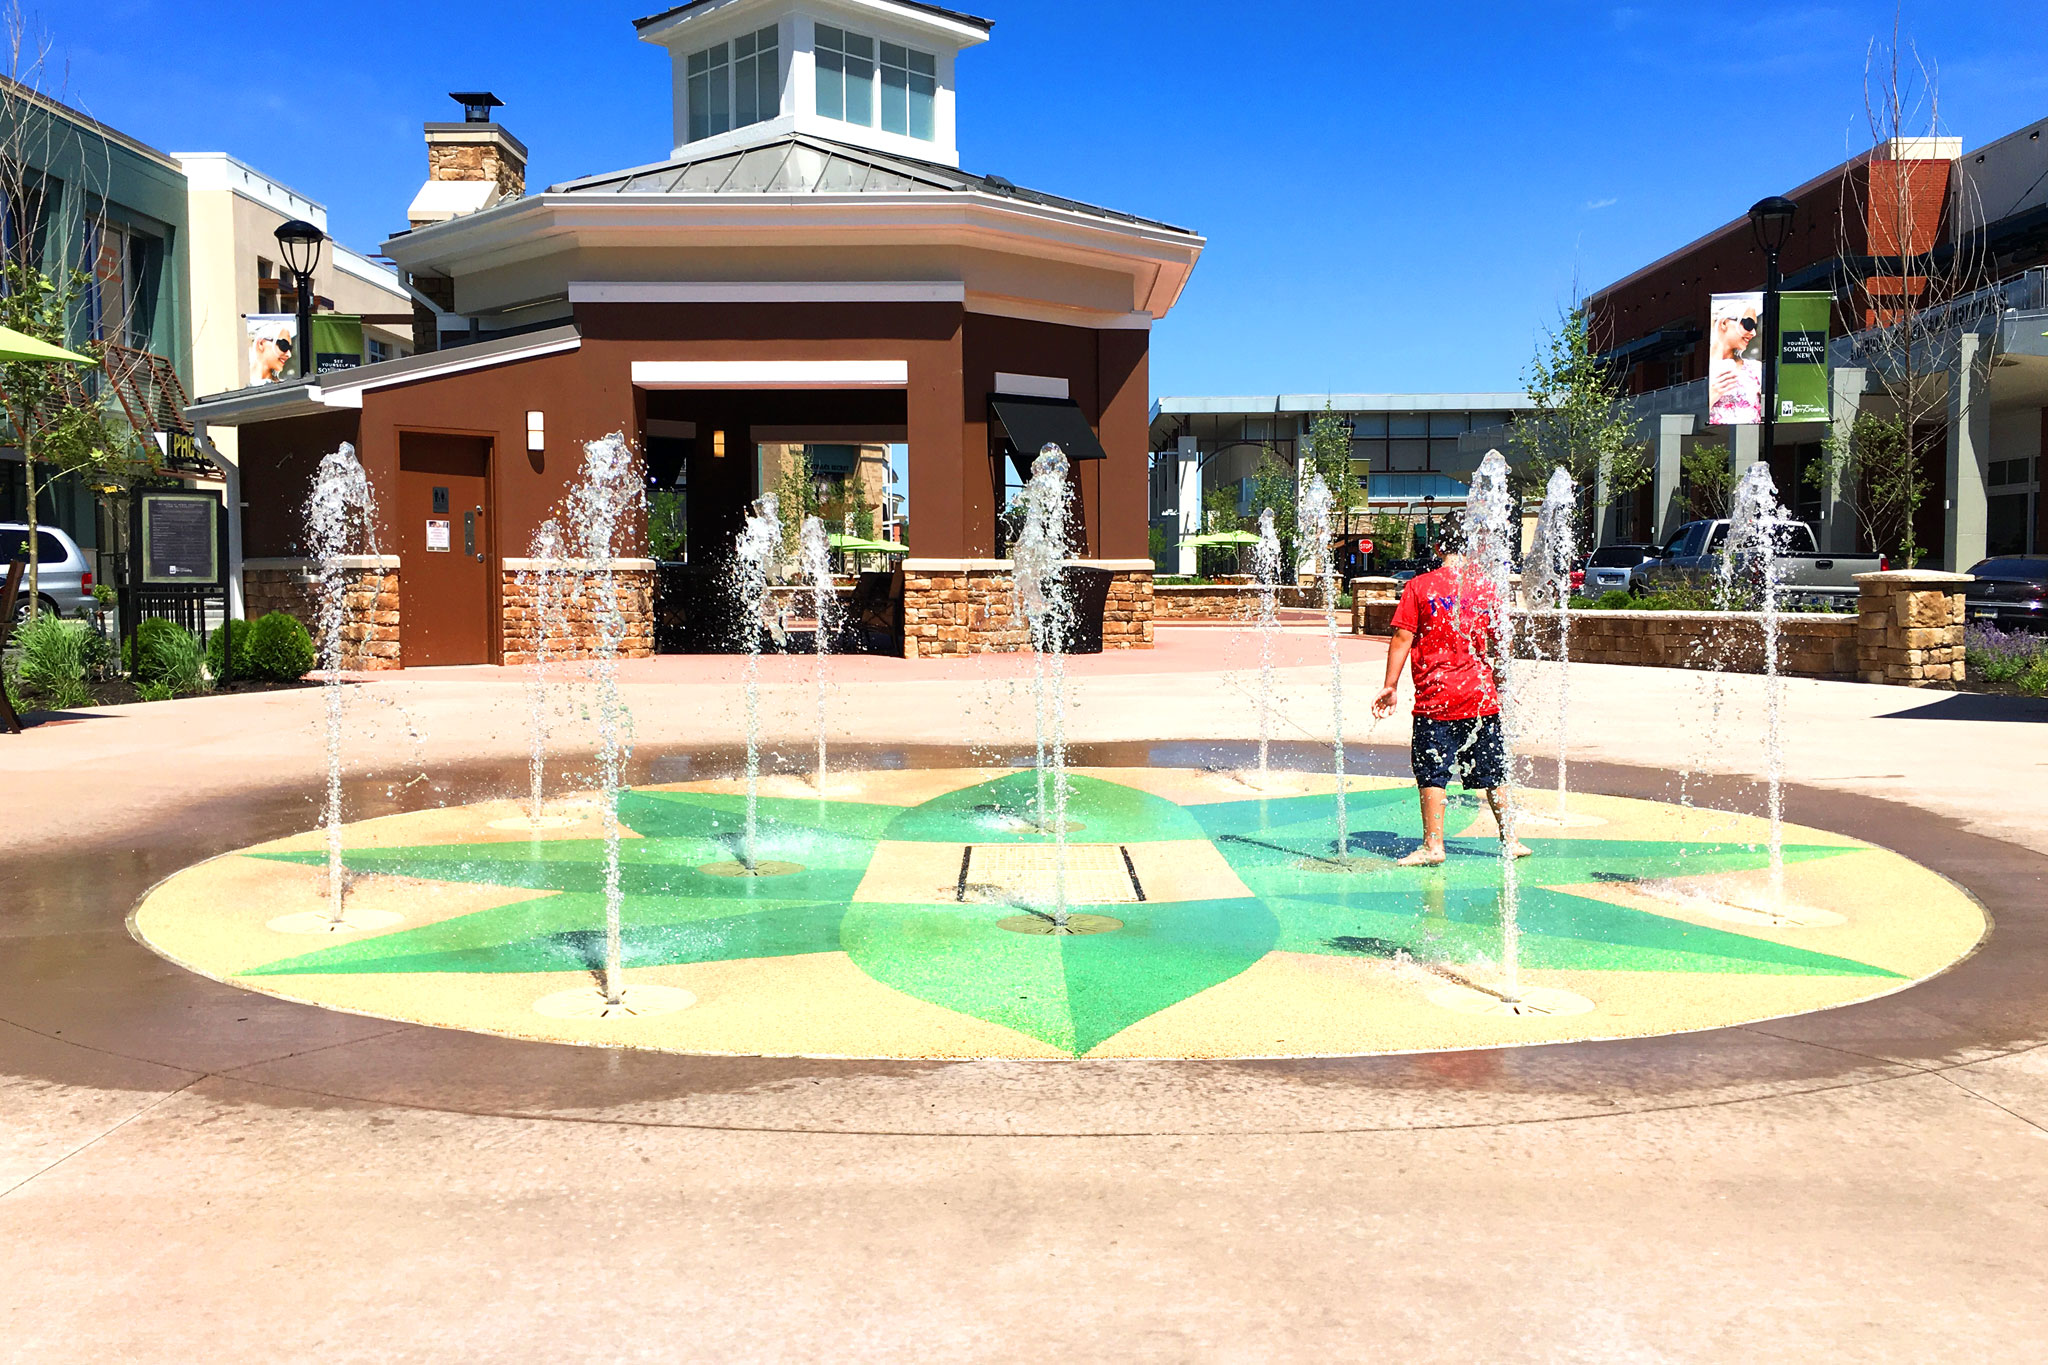 Shops at Perry Crossing - Kids Splash Pad